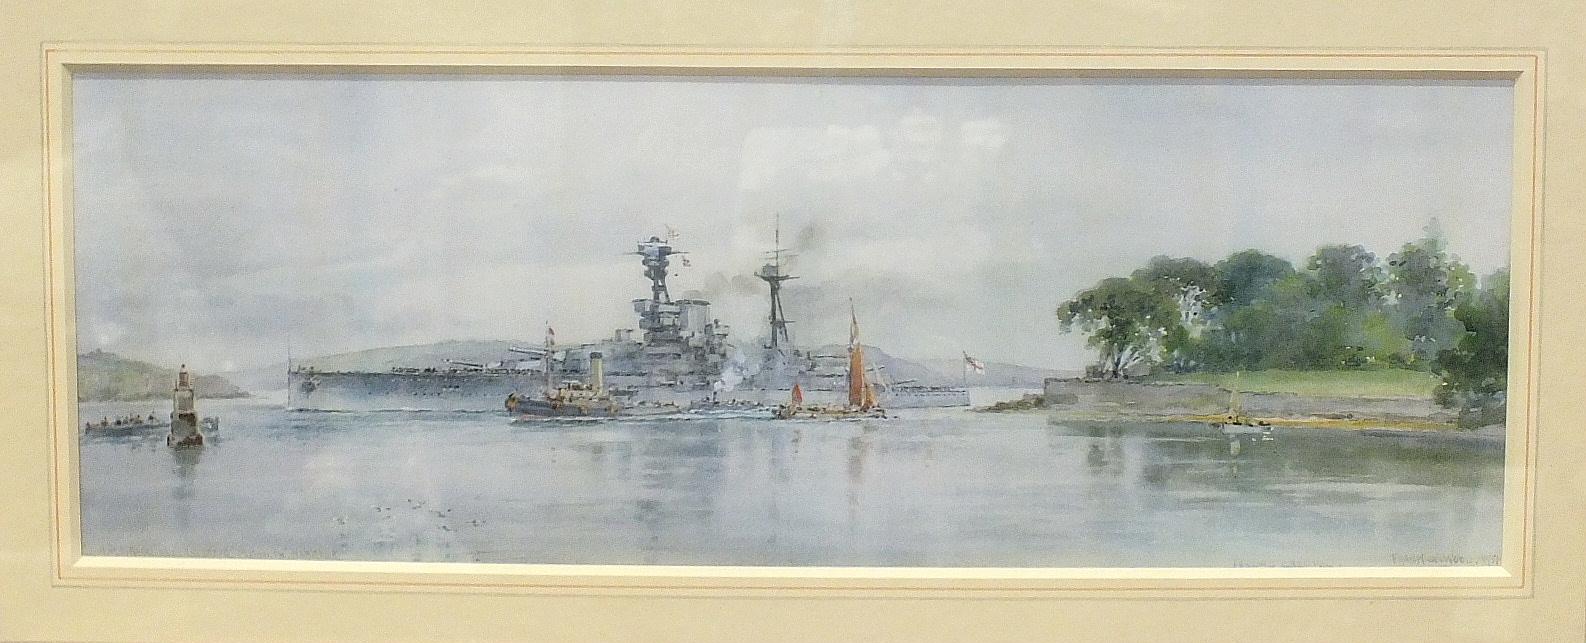 After Frank W Wood, 'HMS Royal Oak Entering Plymouth Harbour', a coloured print, 14 x 41cm.